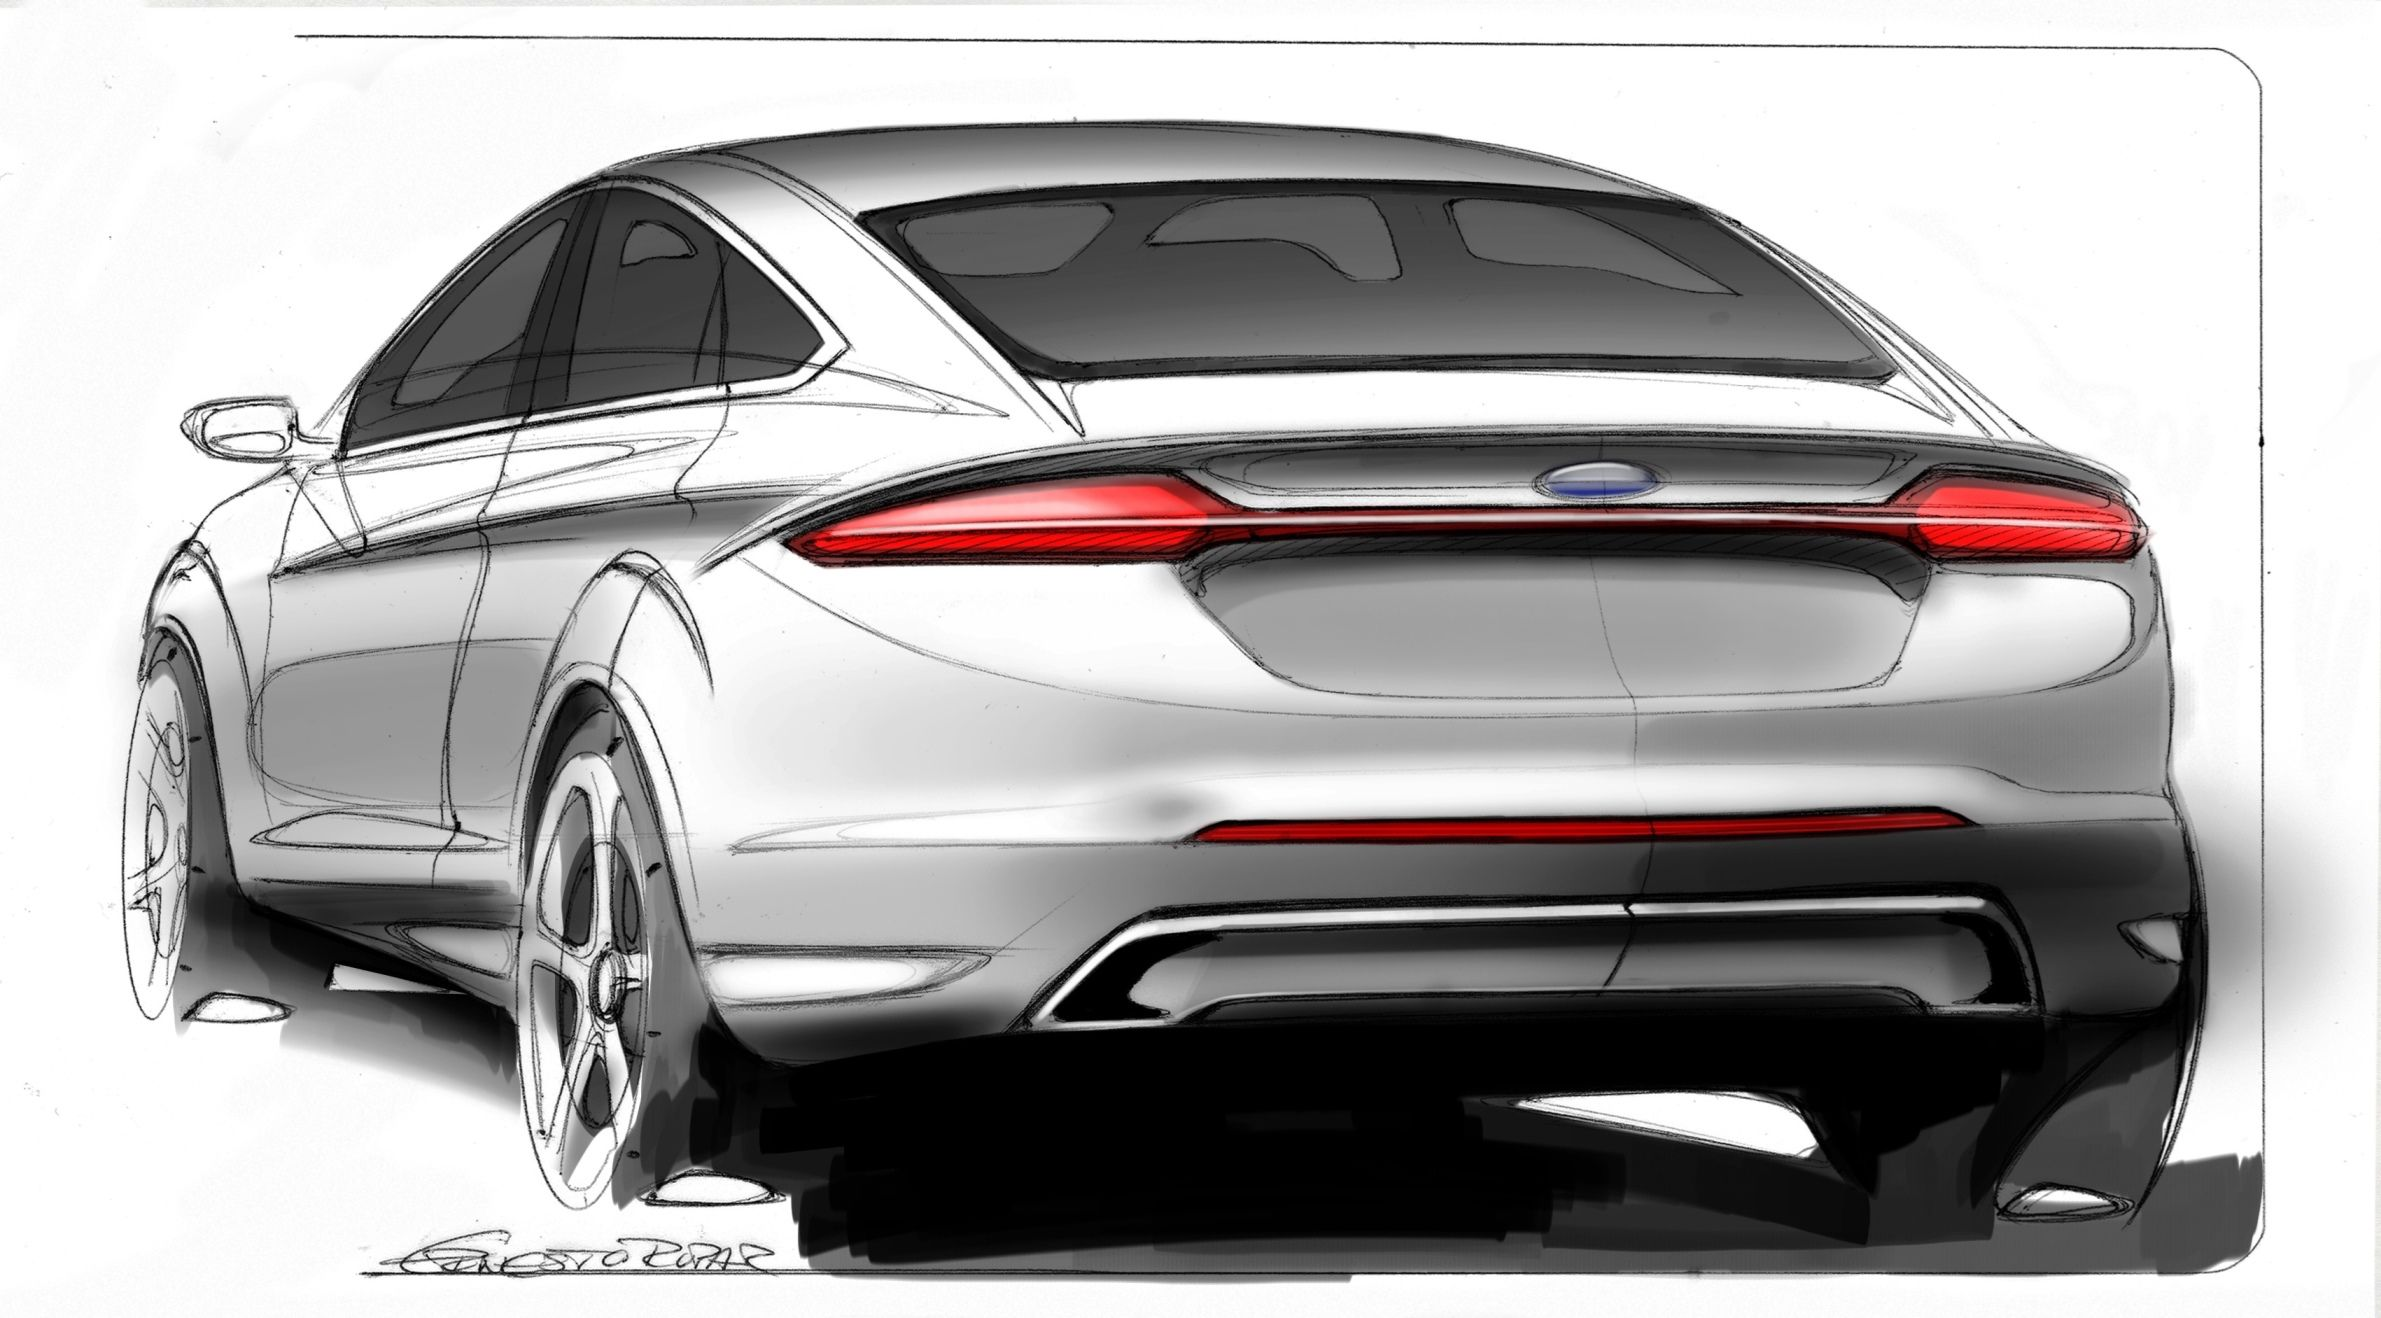 pin by faza bahakim on automotive pinterest car design sketch rh pinterest co uk